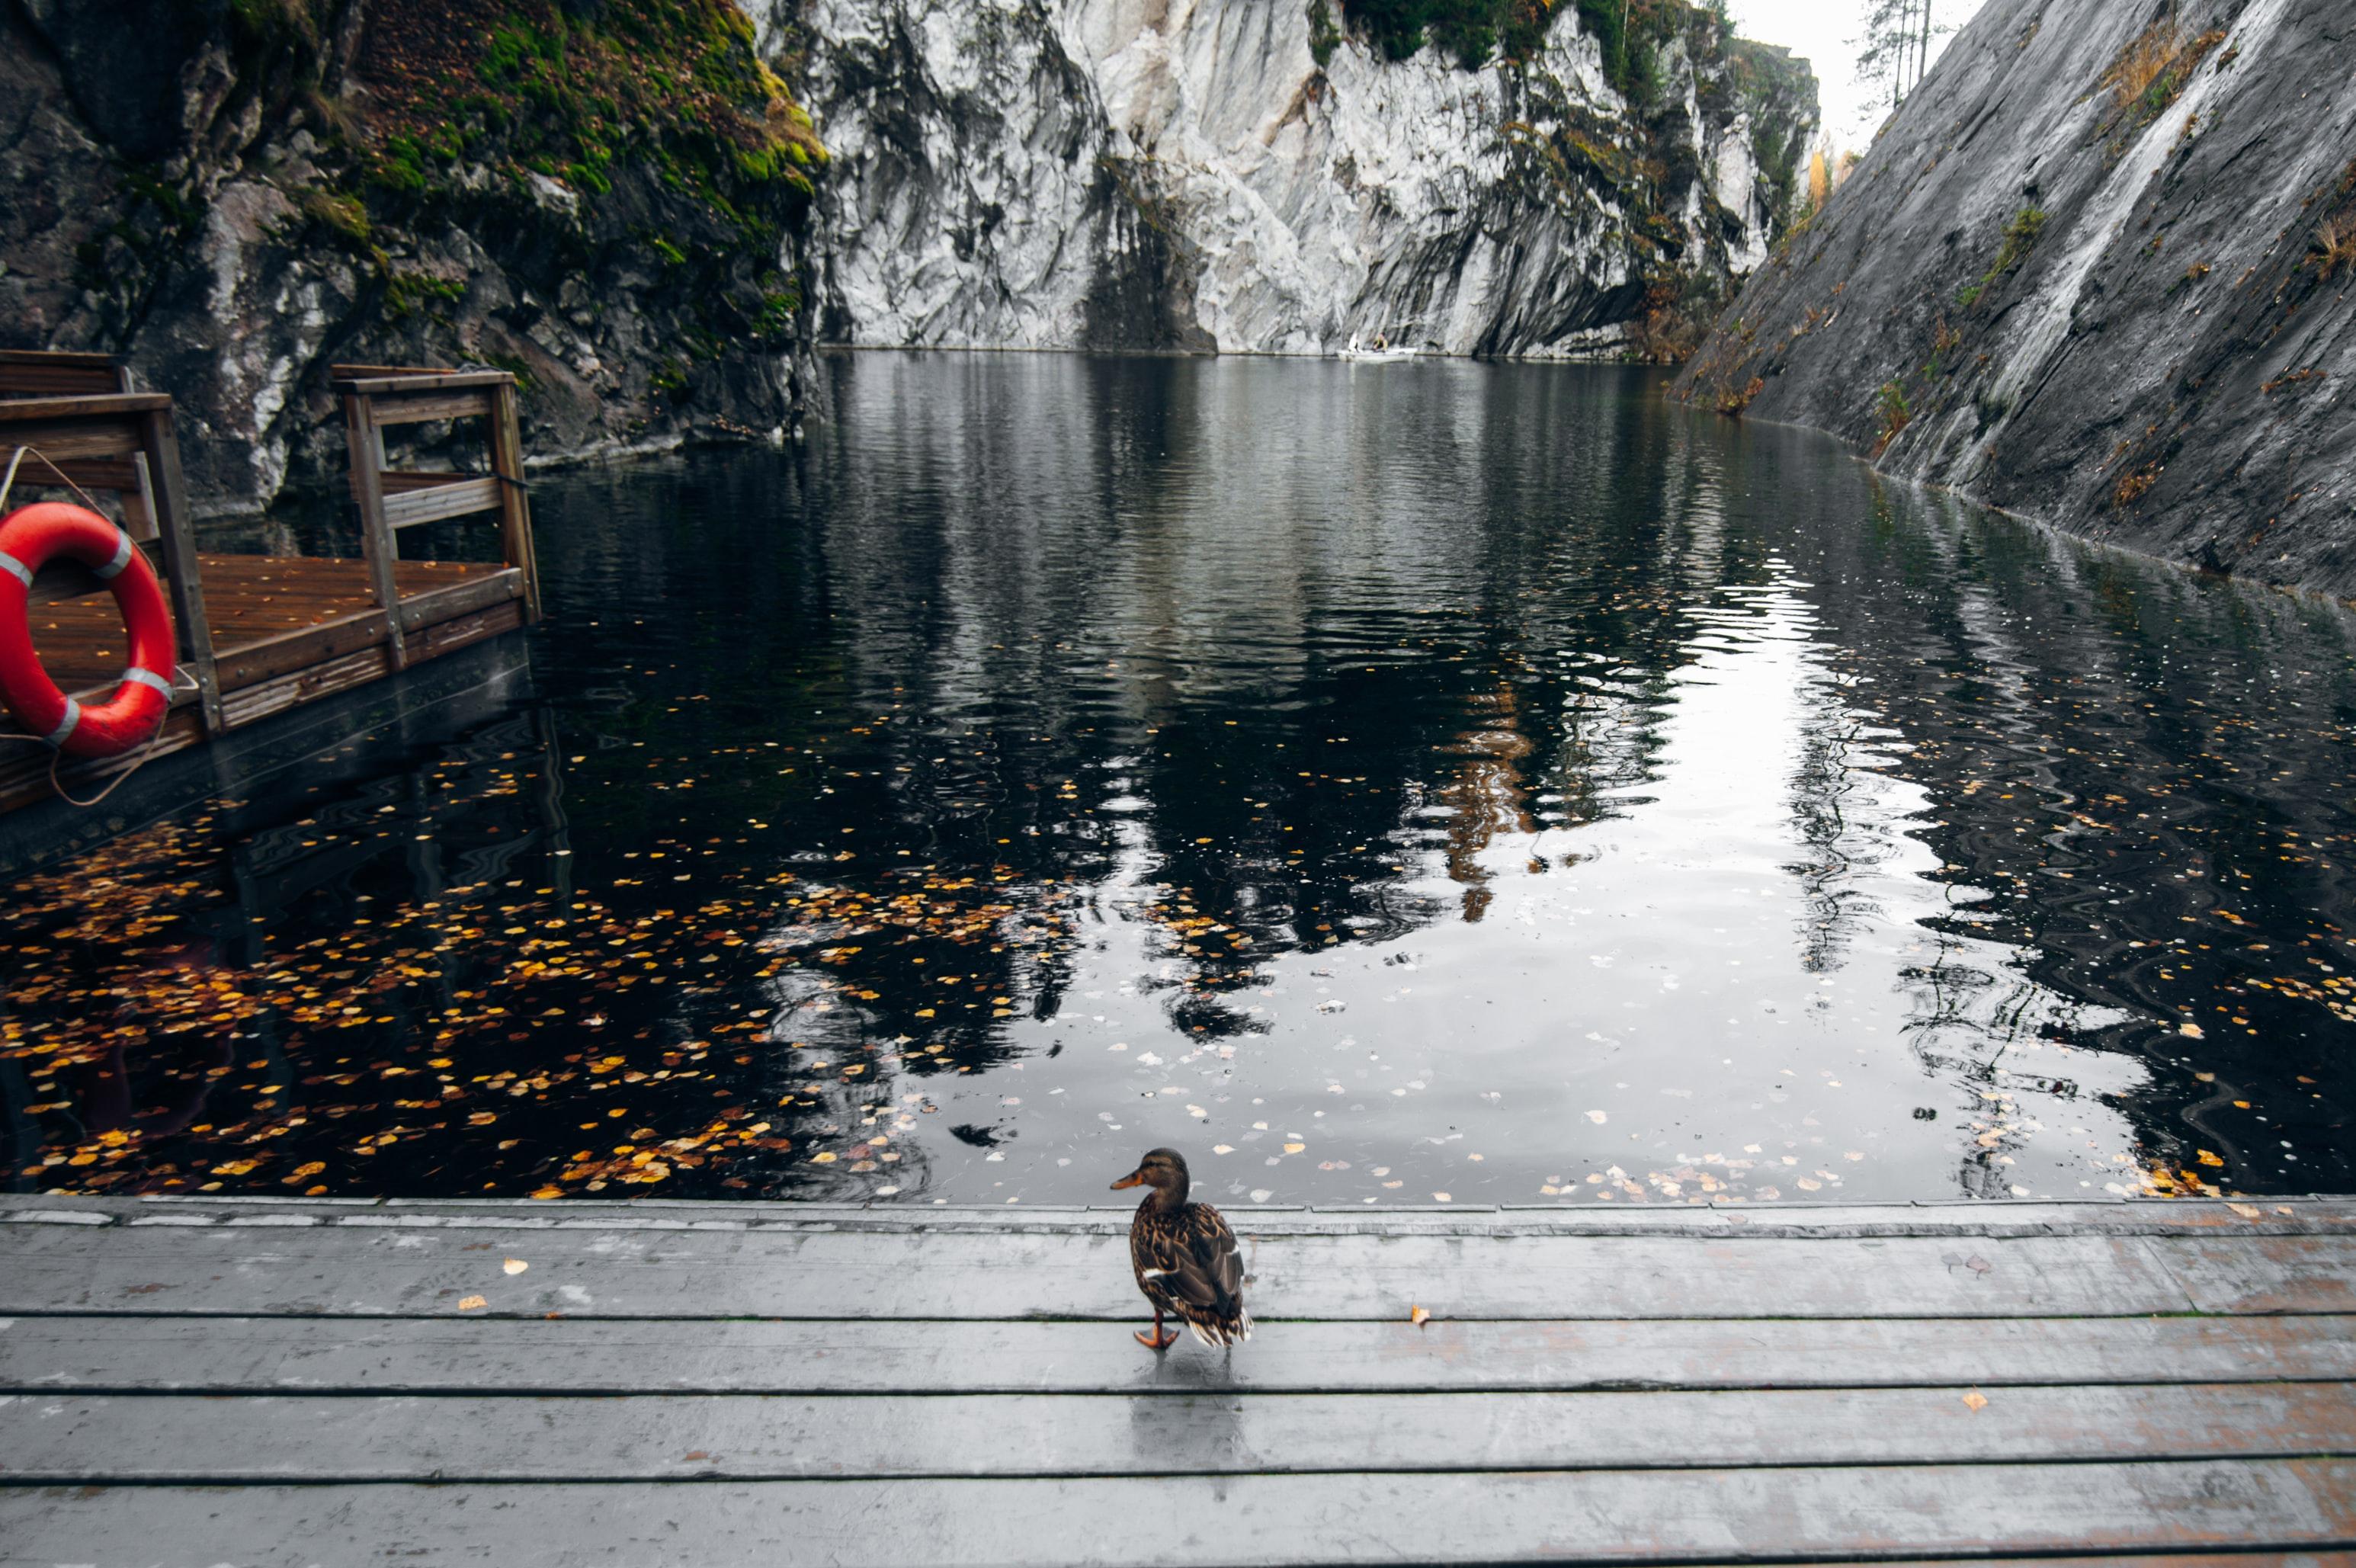 Карелия Рускеала туризм горный парк мраморный каньон